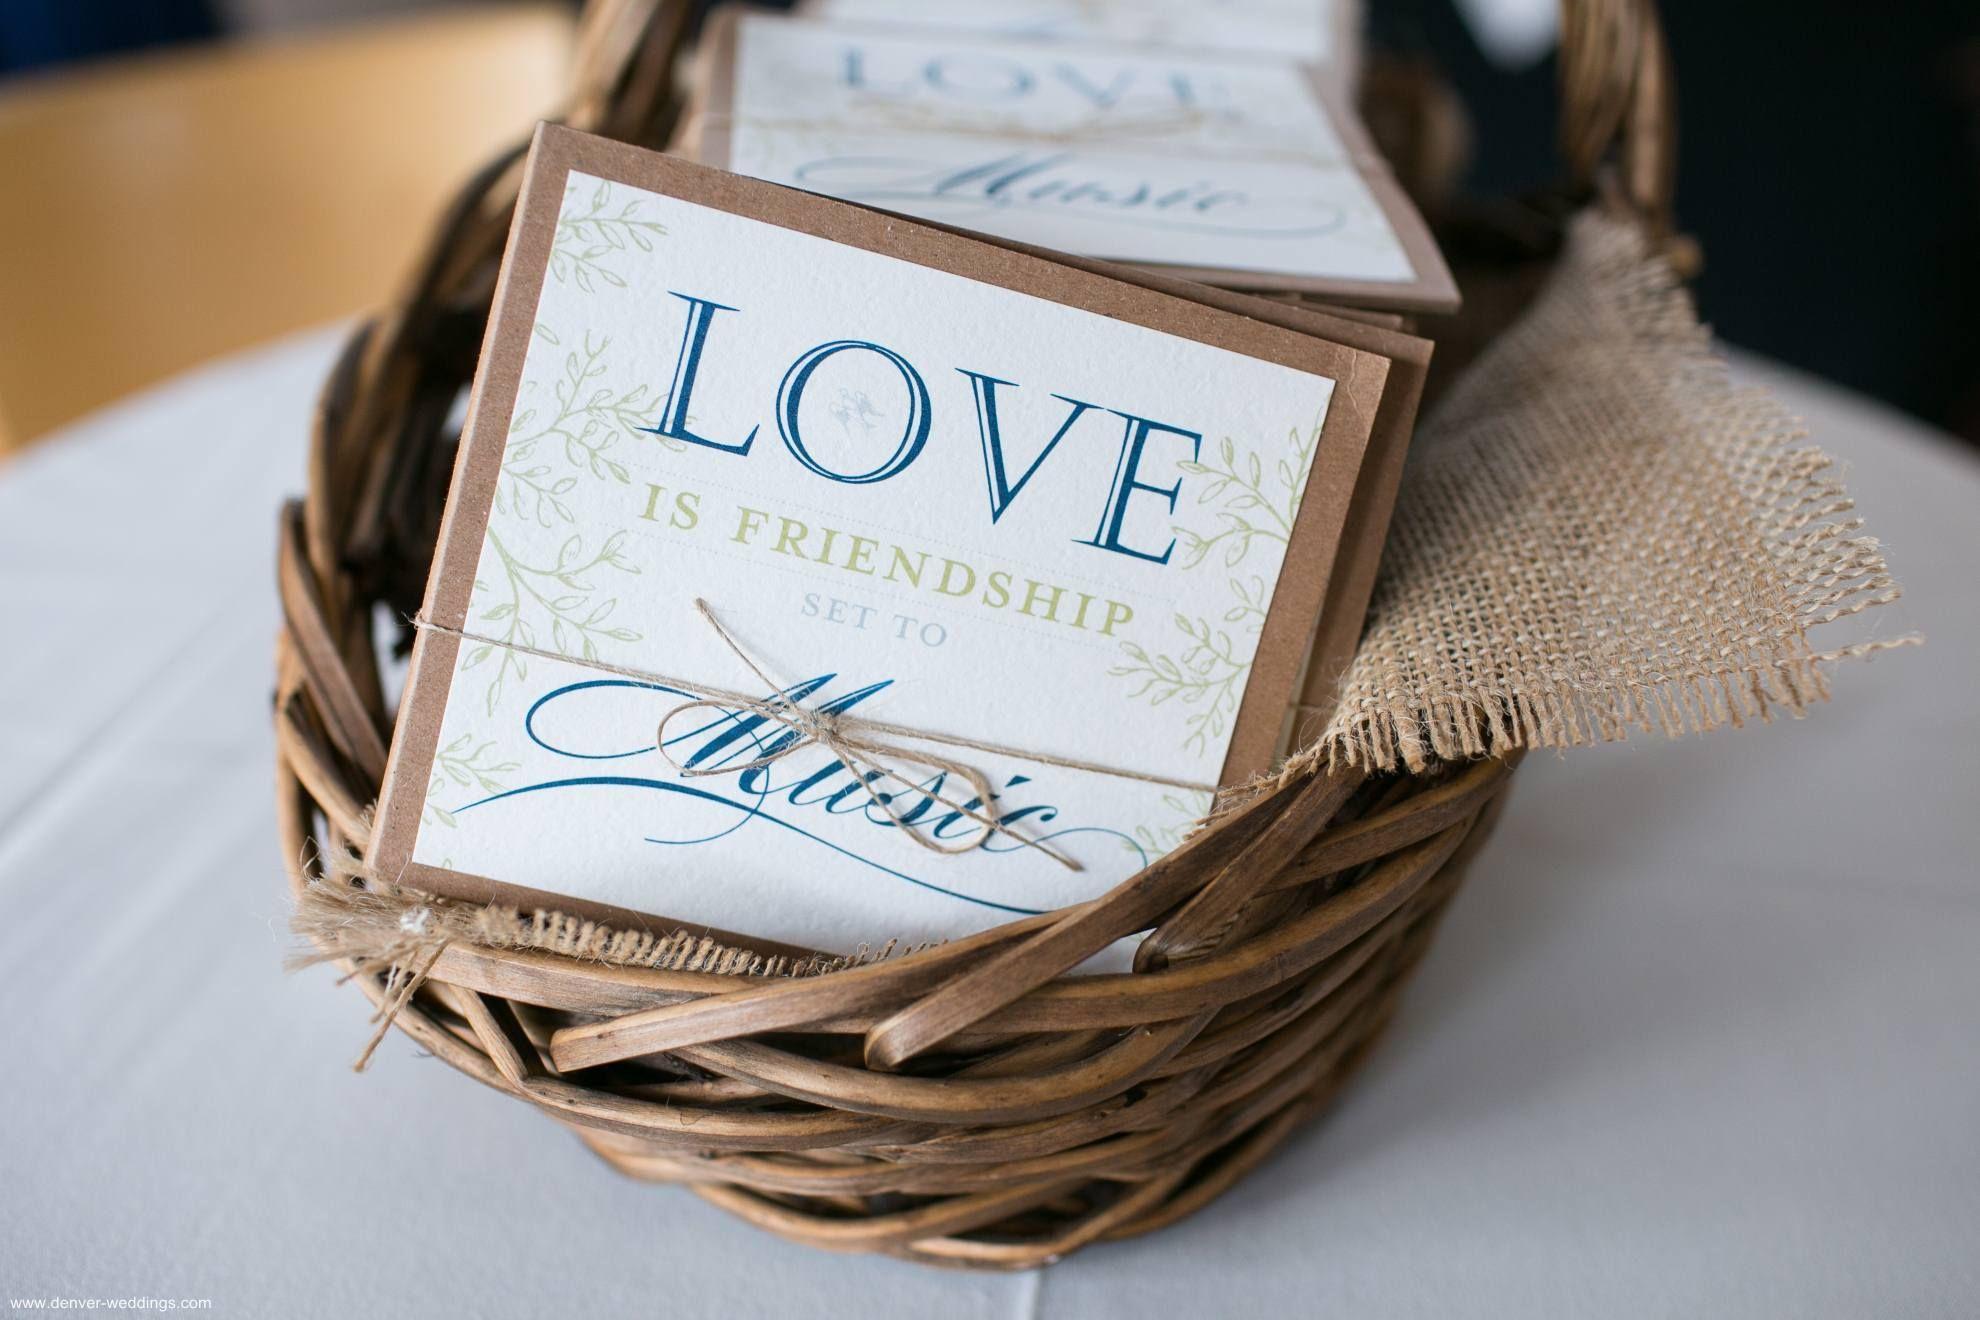 Wedding Cd Favors Wedding Favors Pinterest Wedding Cd Favors